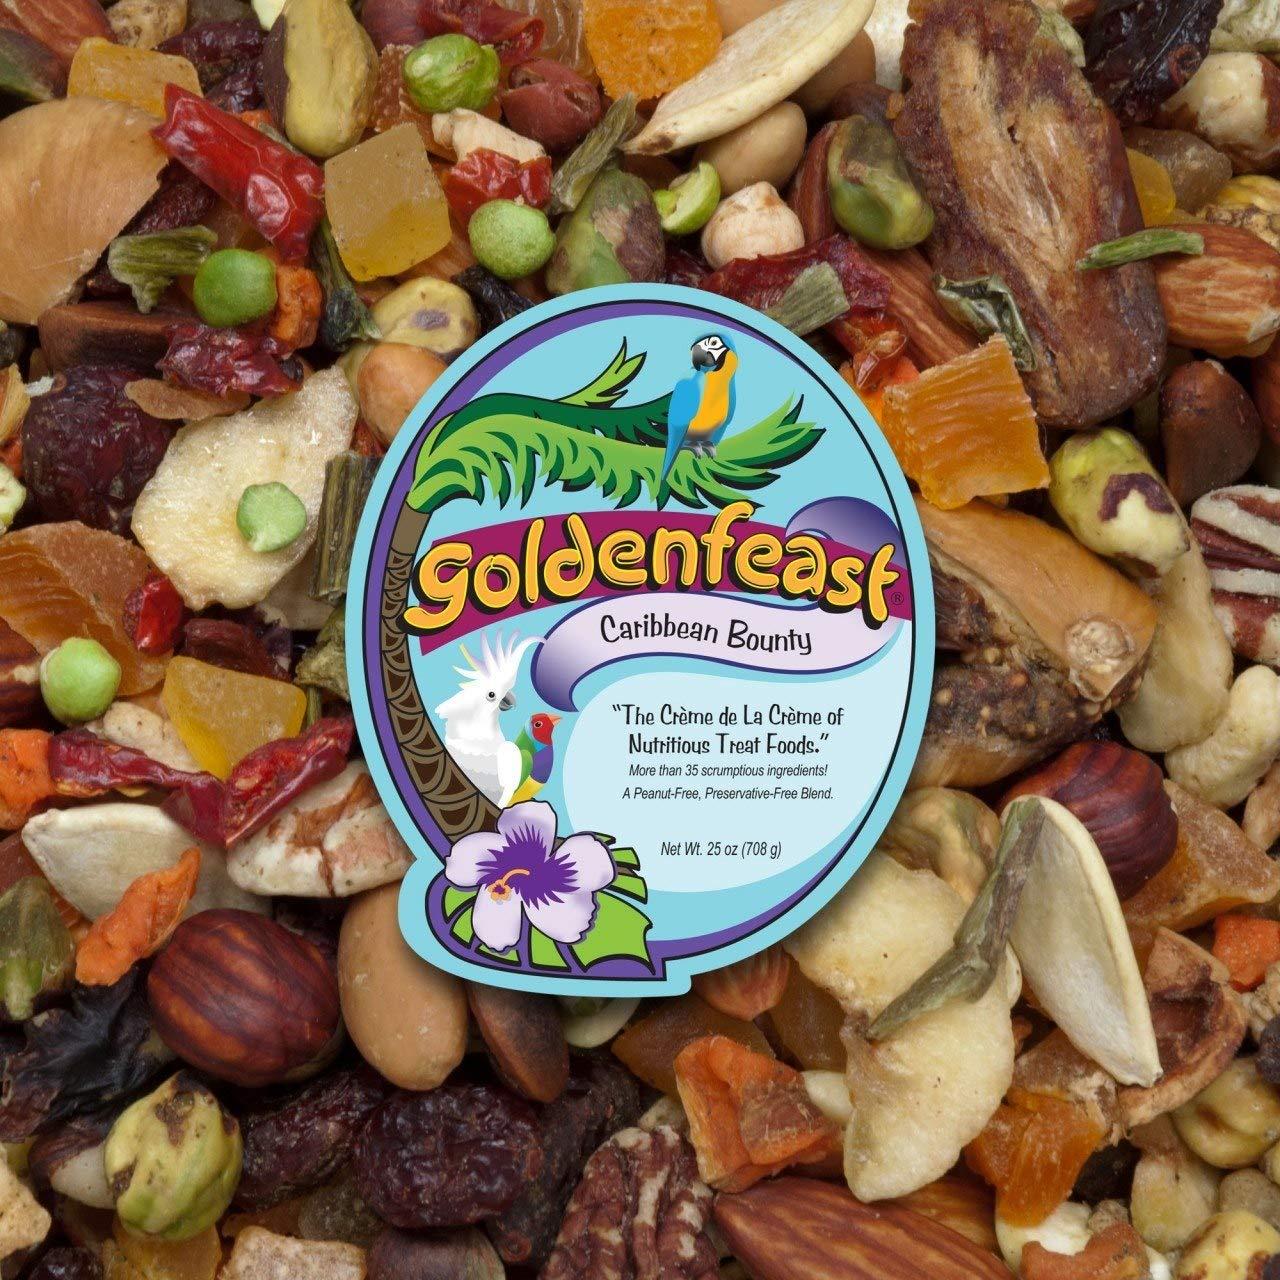 goldenfeast Caribbean Bounty 25 Oz